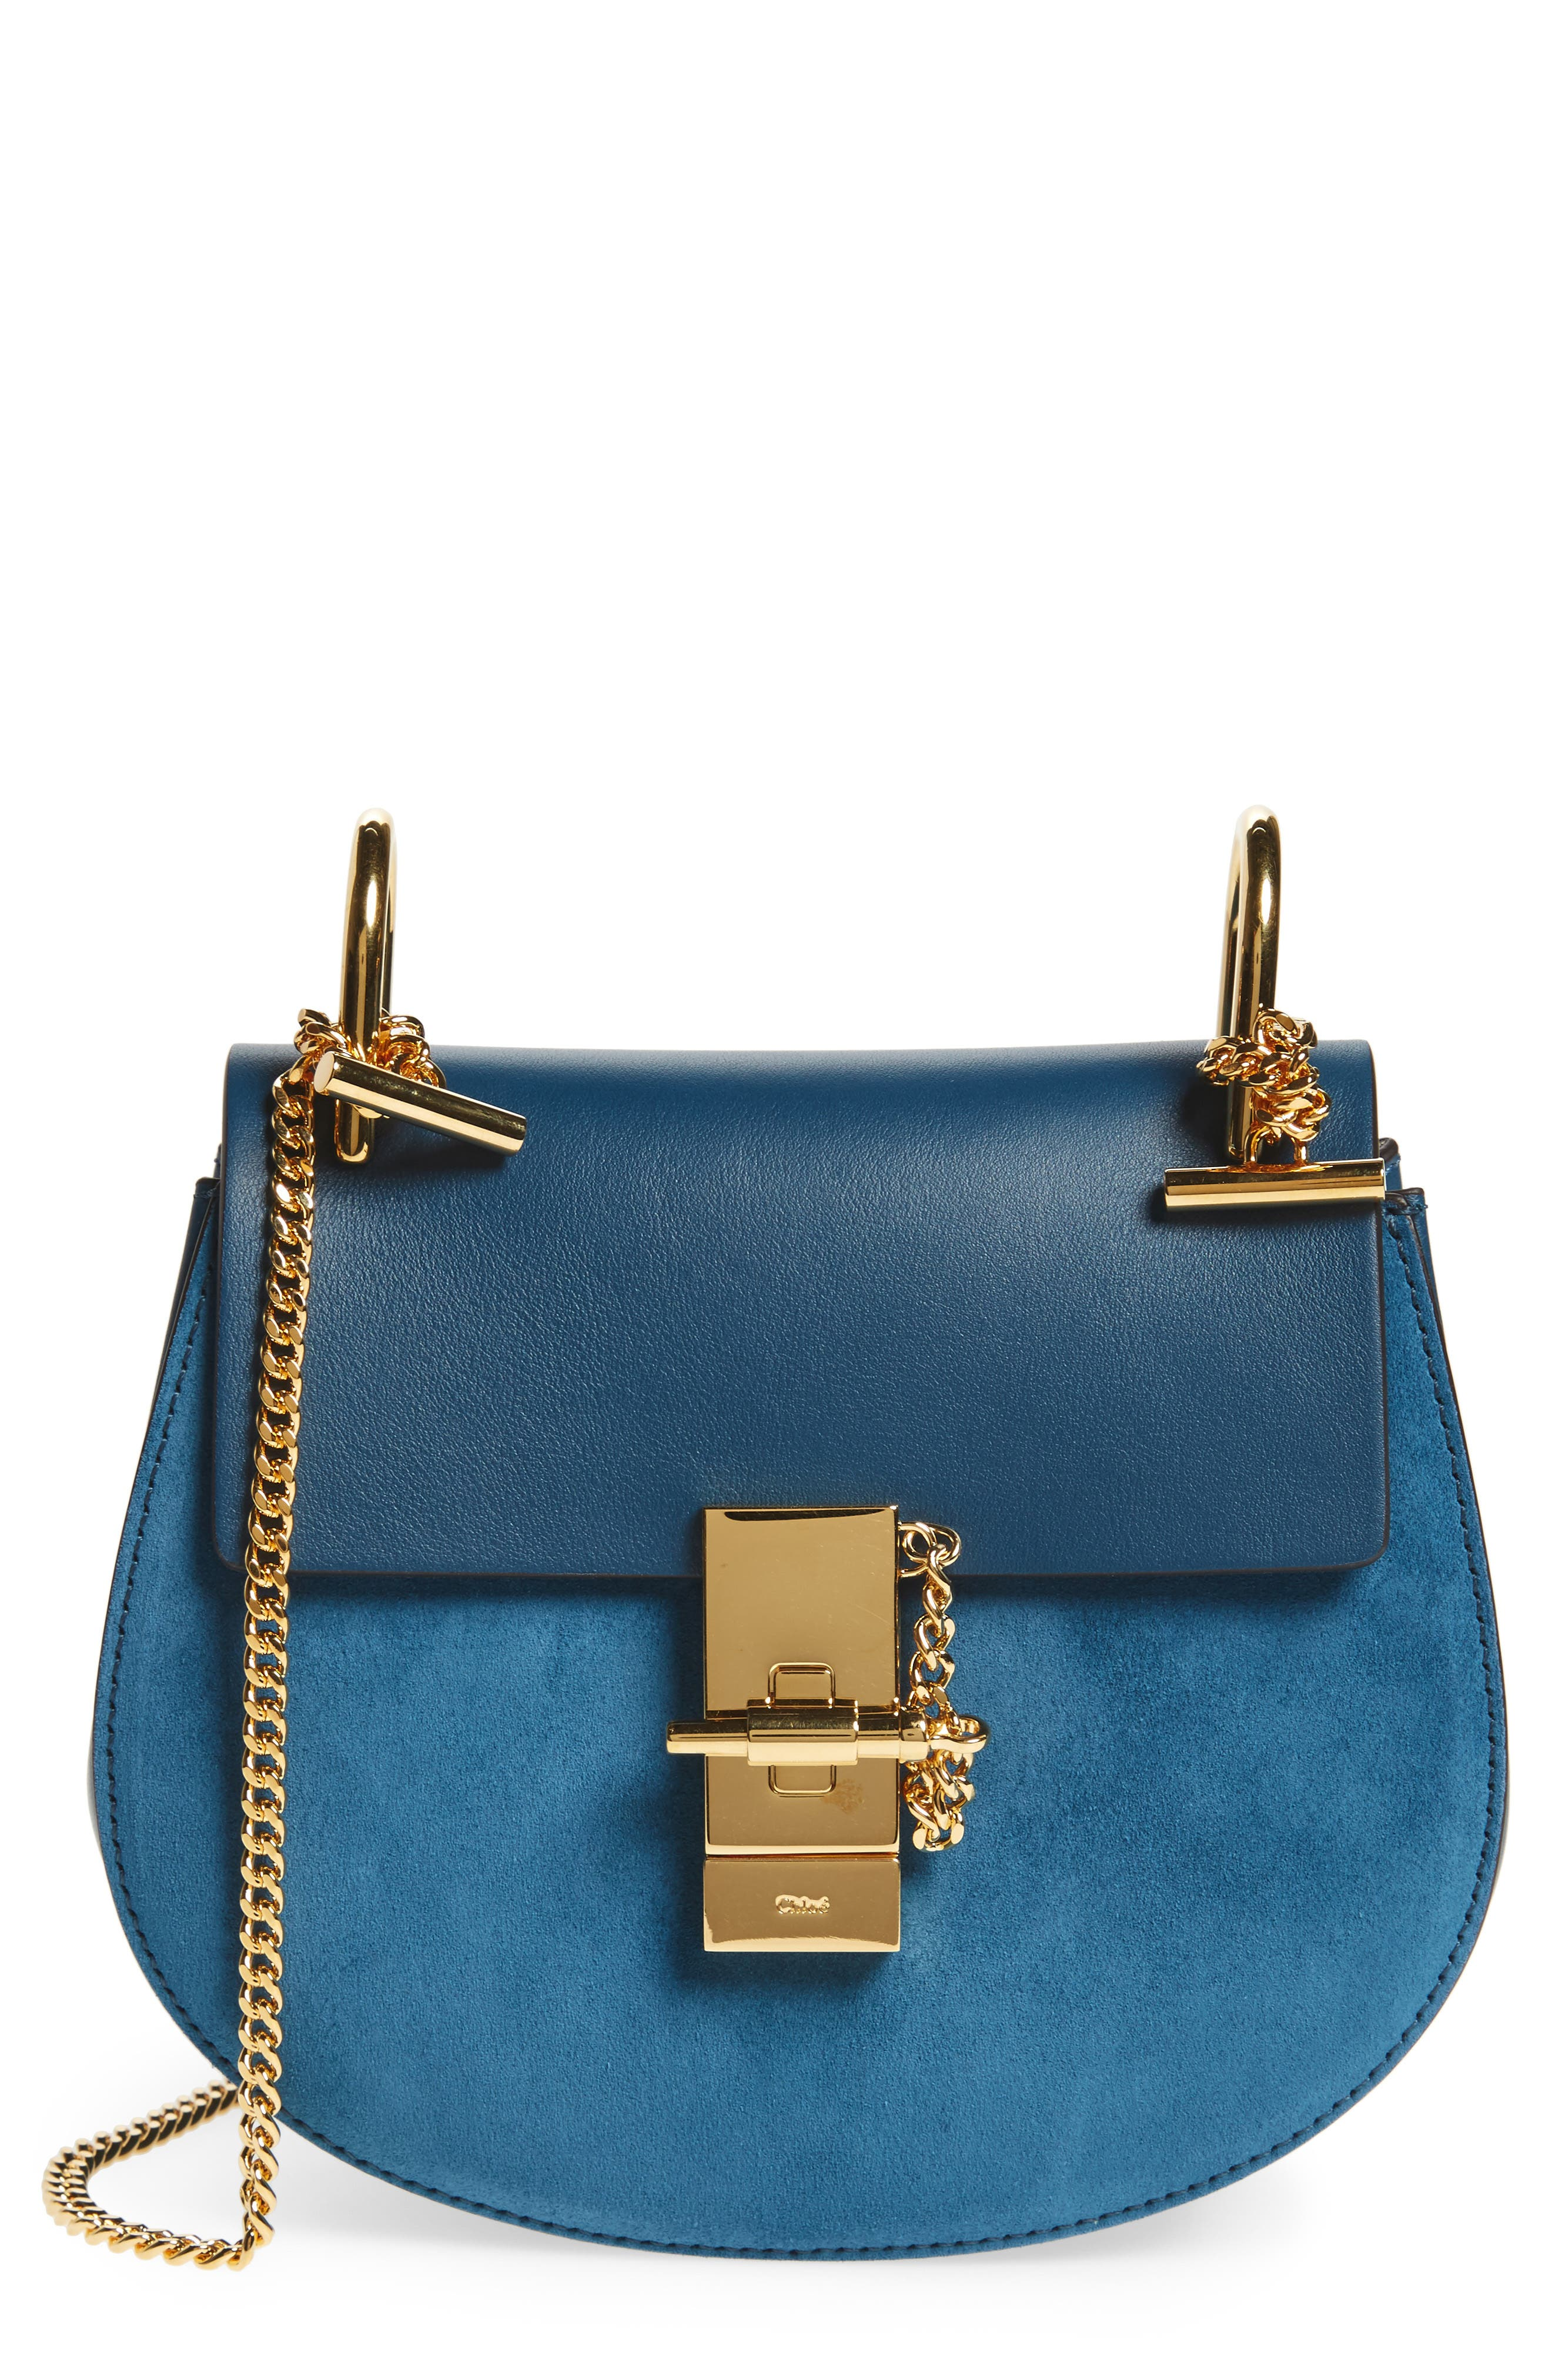 CHLOÉ 'Mini Drew' Leather Crossbody Bag